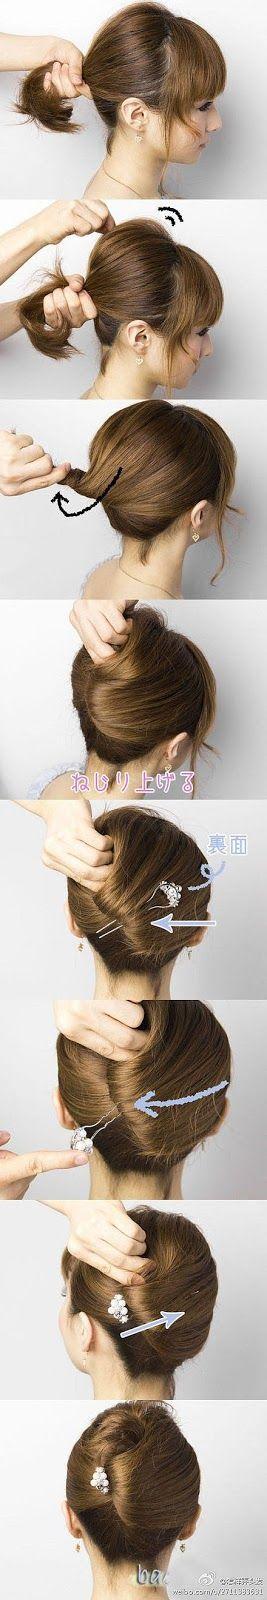 tutorial on updo for short hair  http://www.hairstylo.com/2015/07/updos-for-short-hair.html